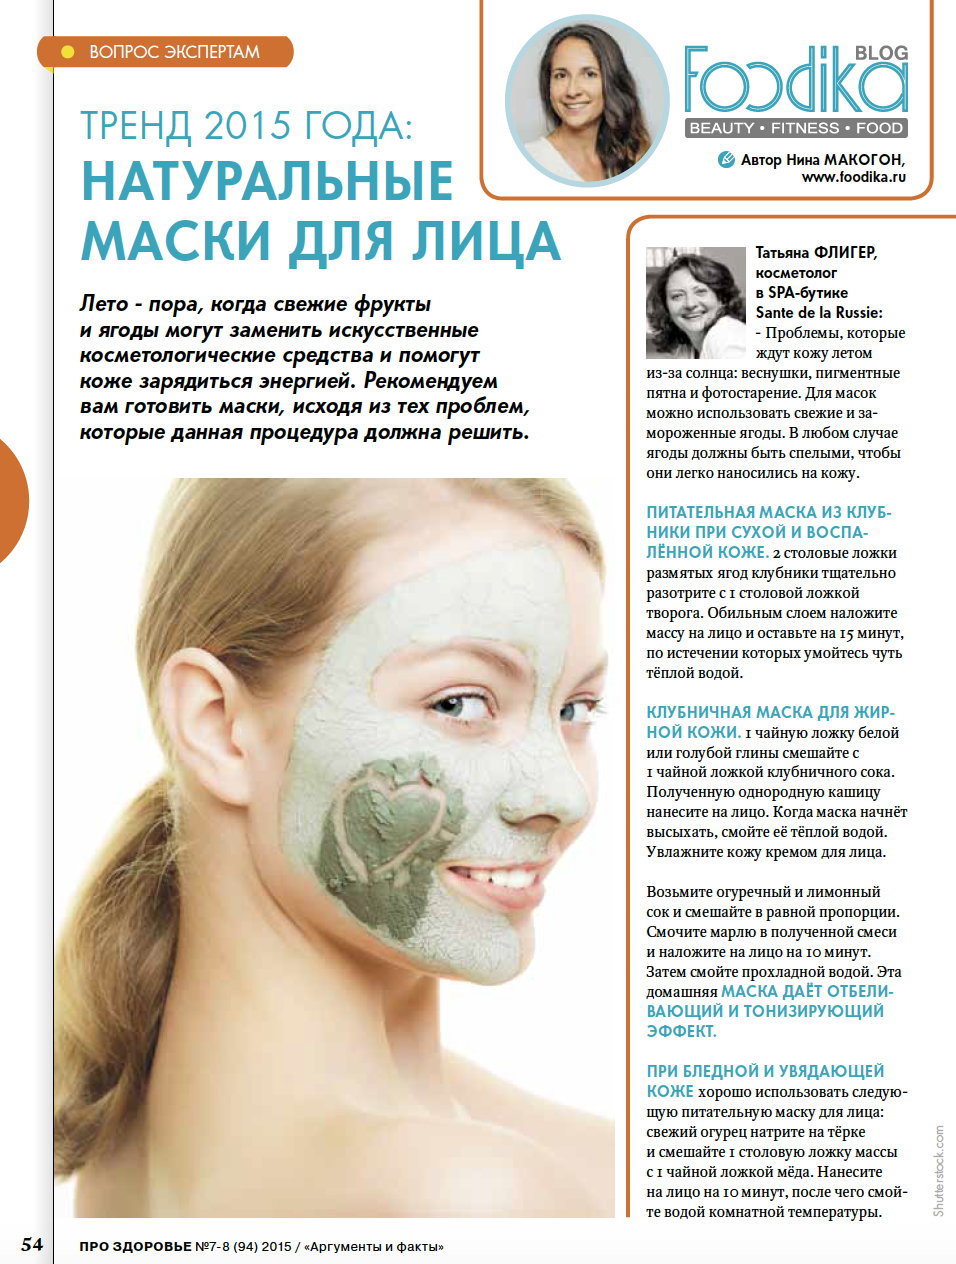 Журнал «АиФ про здоровье», июль - август 2015